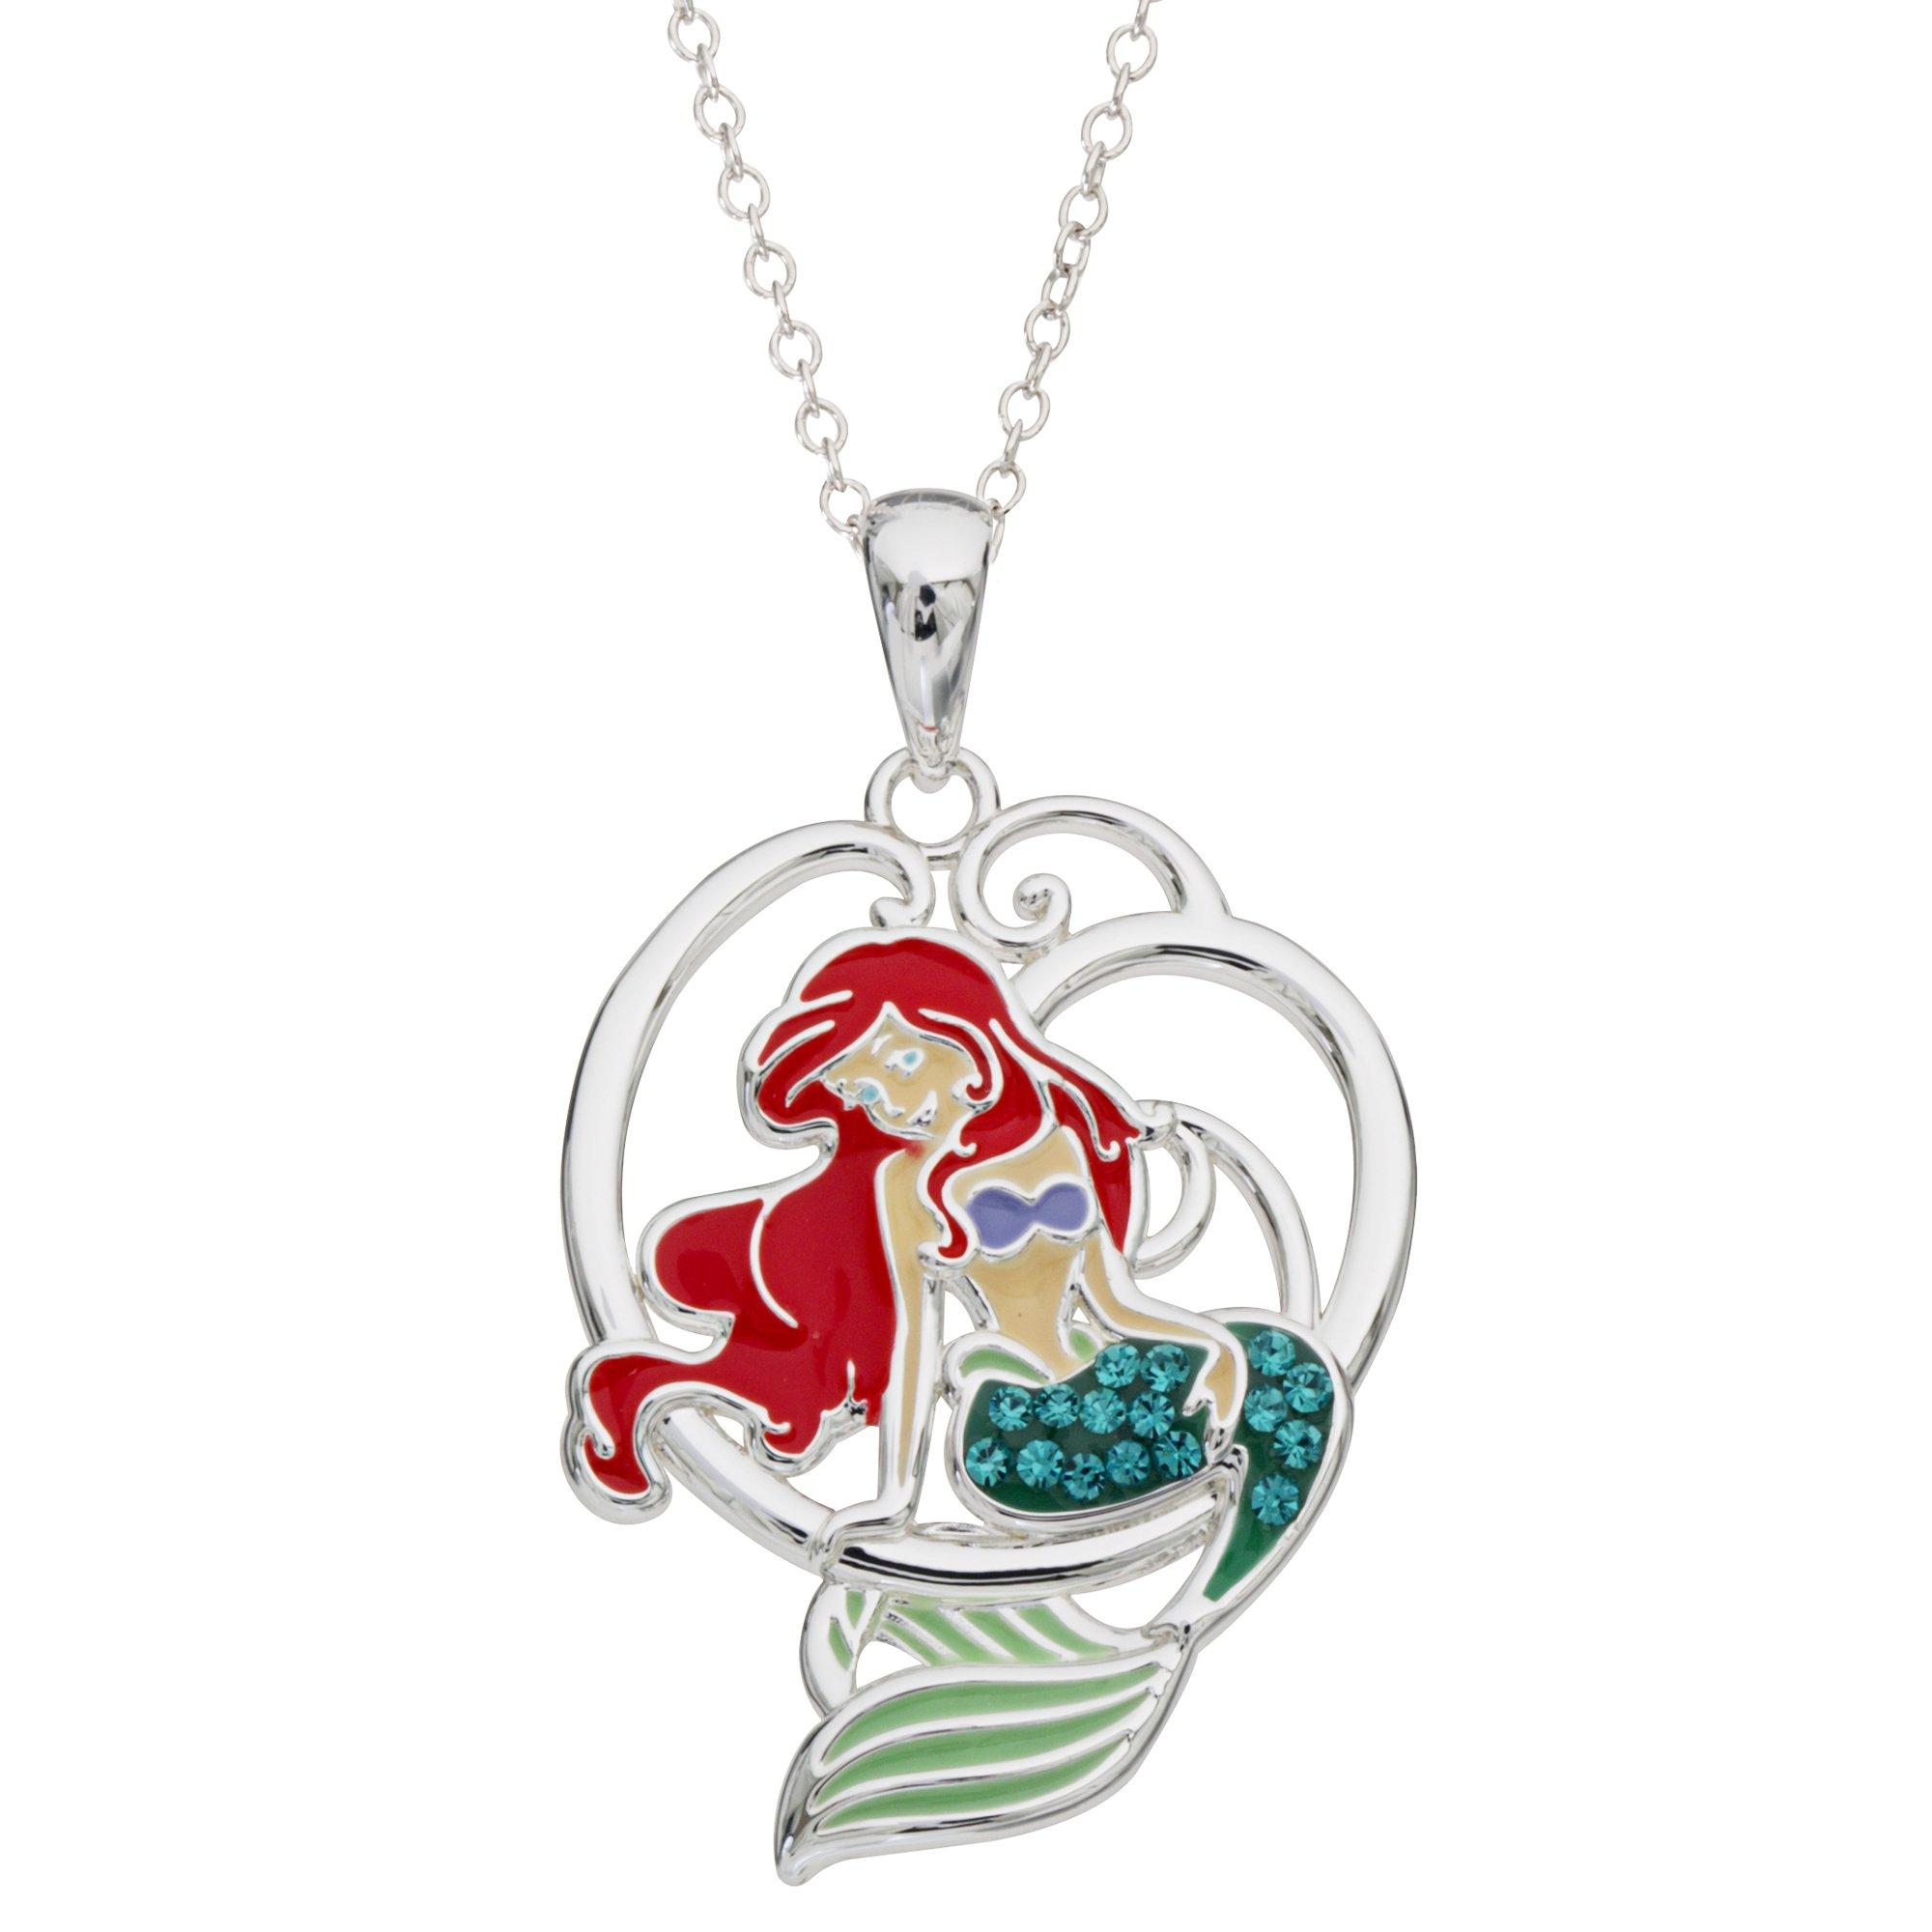 Disney Little Mermaid Ariel Silver Plated Crystal Pendant, 18''